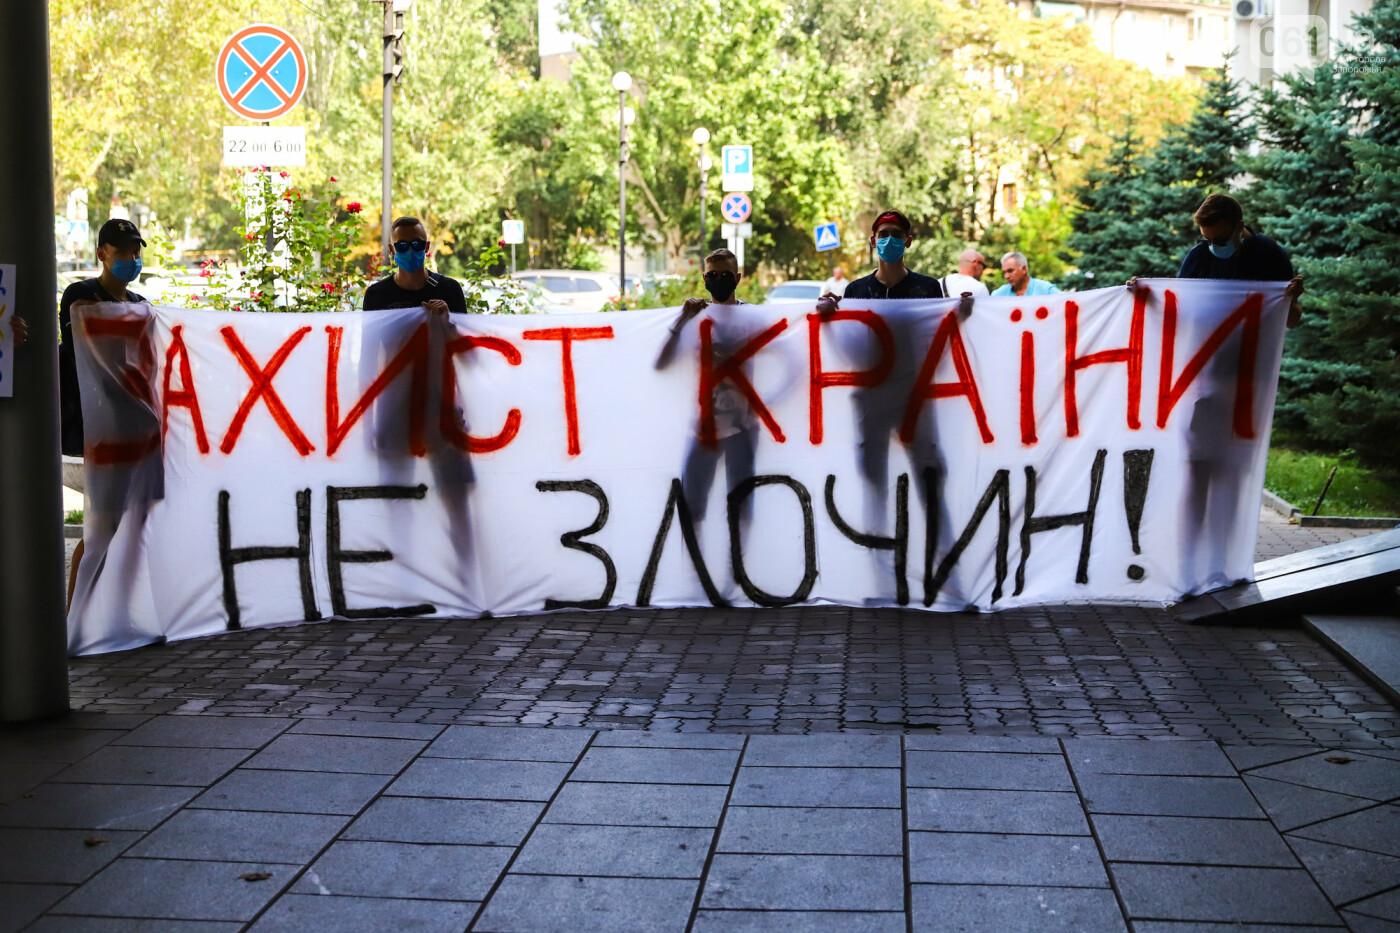 """Захист країни - не злочин"": в Запорожье патриоты провели митинг у стен нацполиции, - ФОТОРЕПОРТАЖ , фото-15"